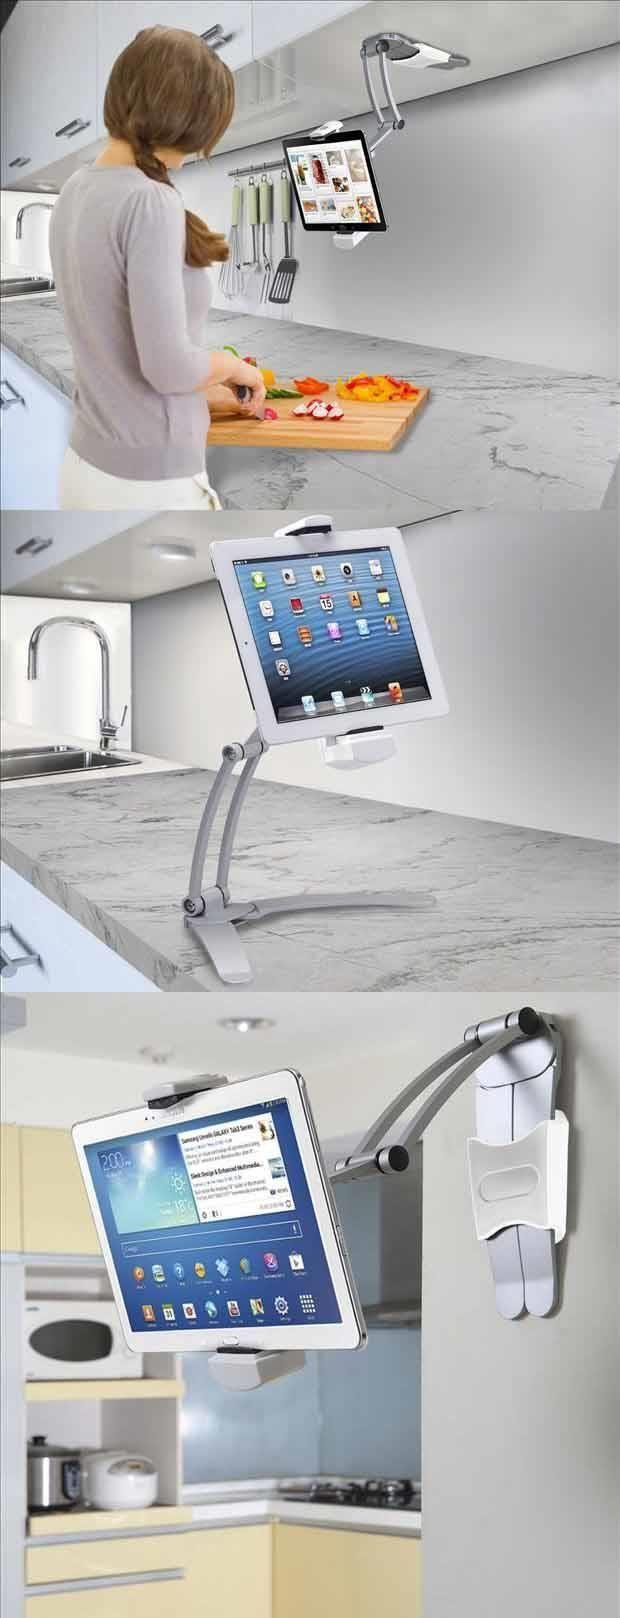 Amazon.com: #Kitchen Mount #Stand for iPad Air, iPad mini, Surface ...